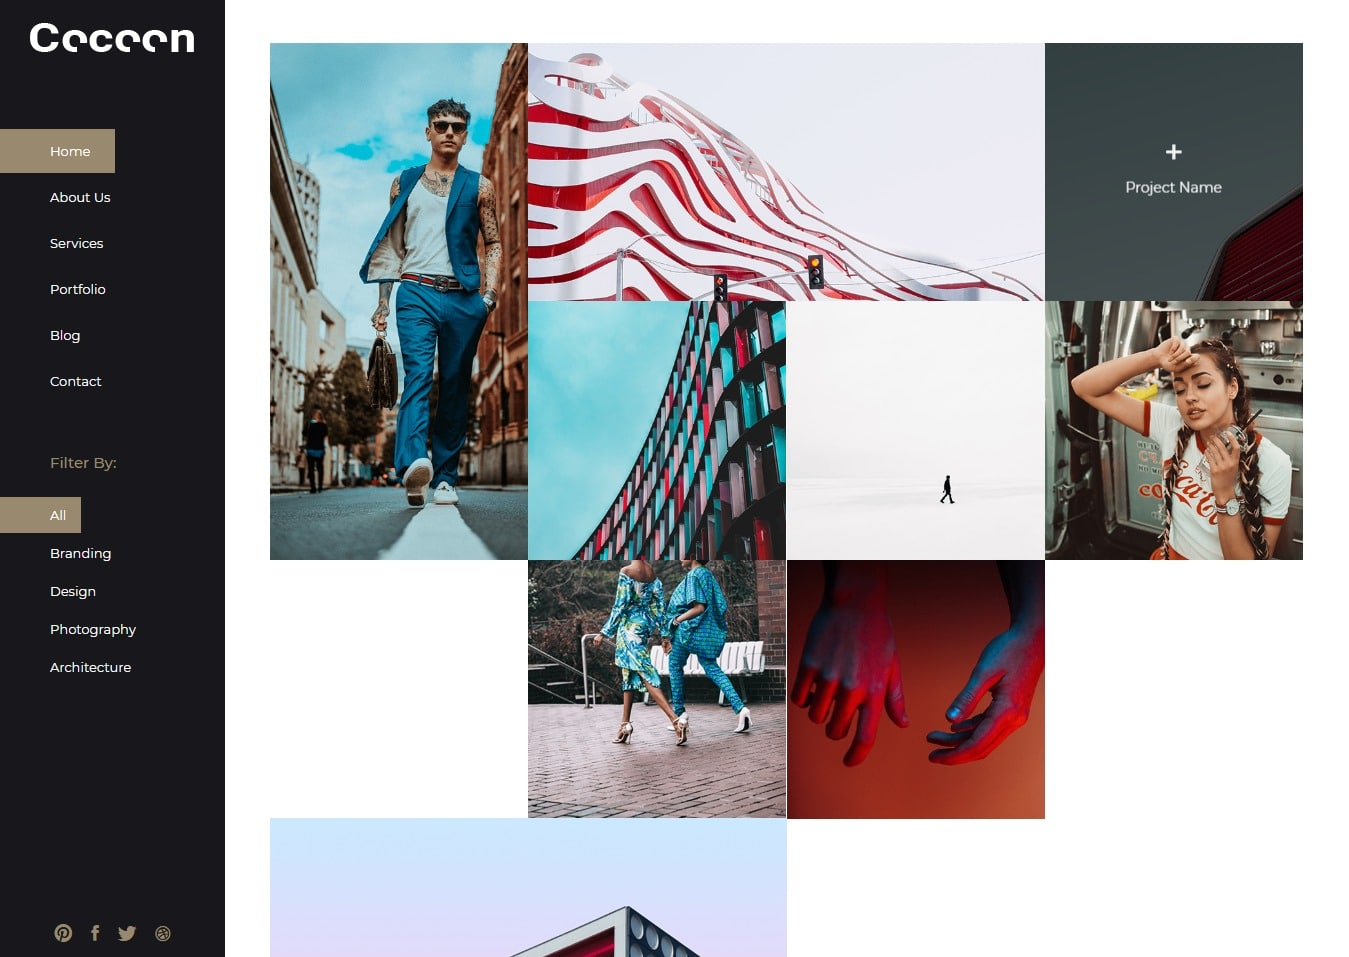 cocoon-gallery-website-template